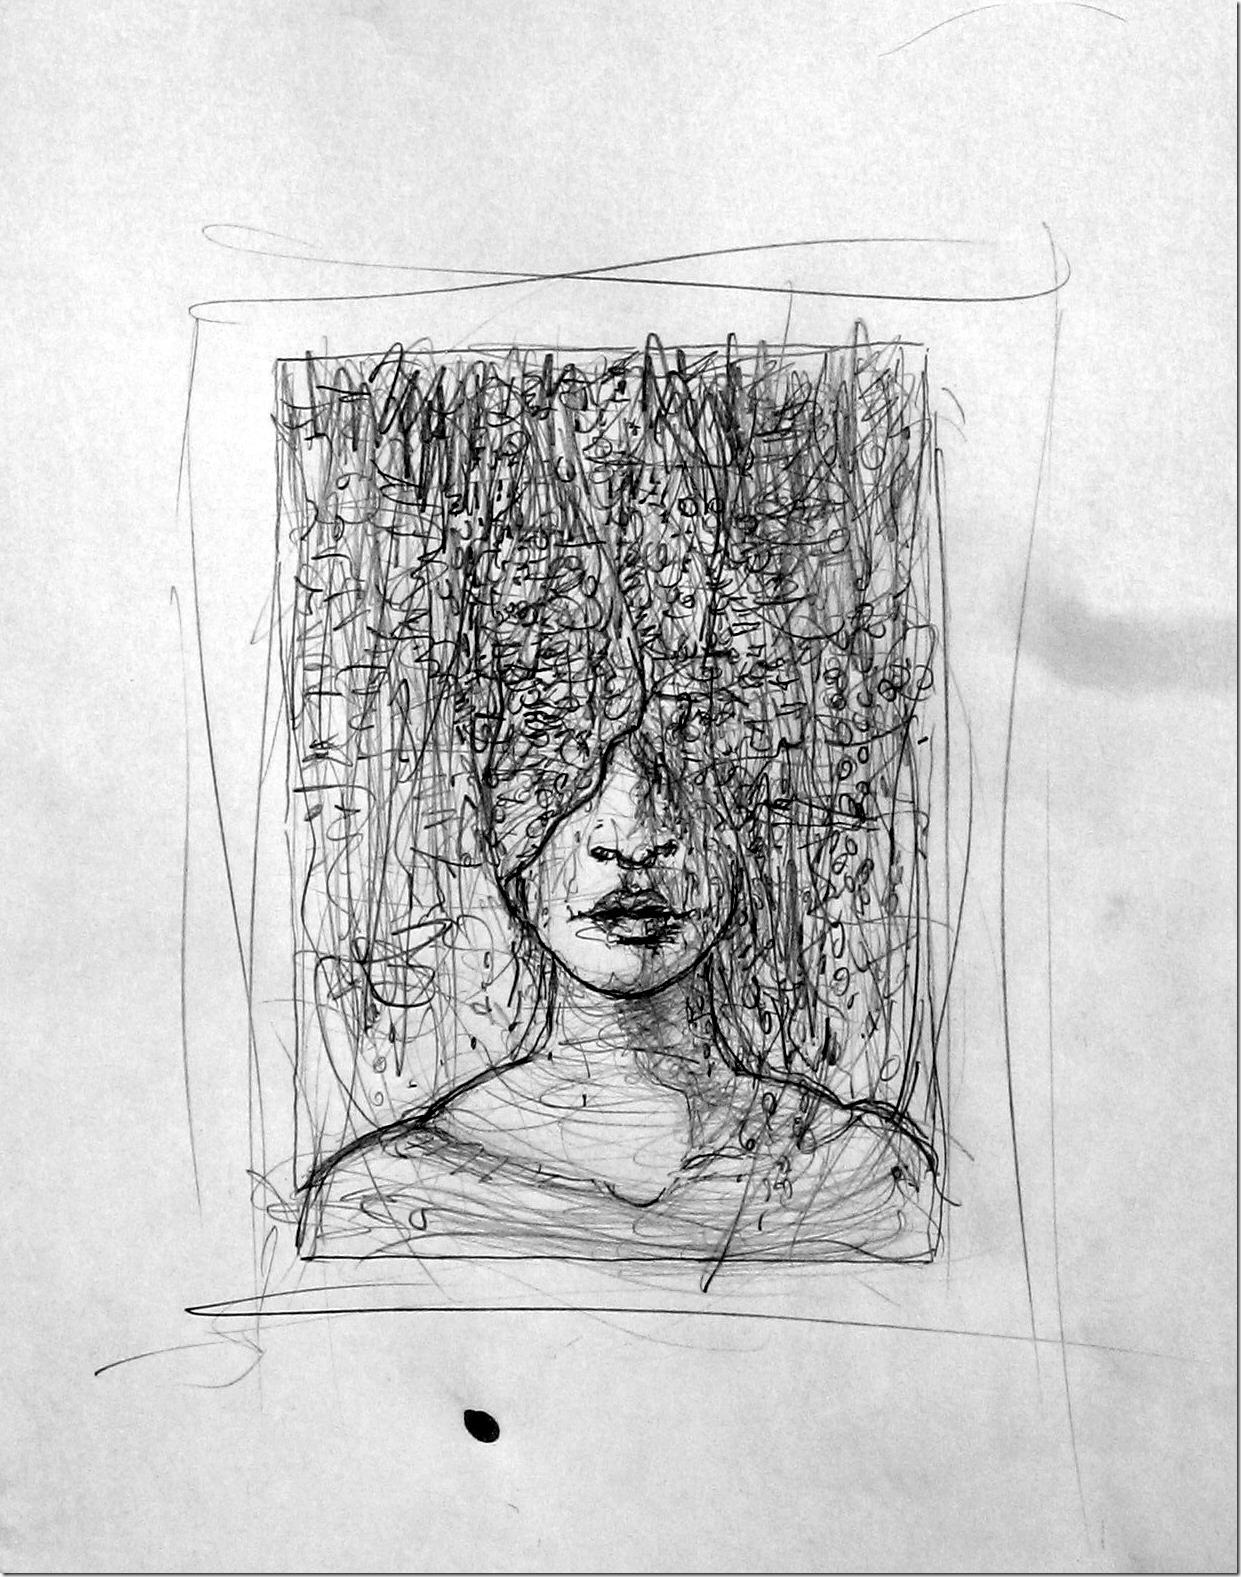 empress-skizze-by-arkis-07-17